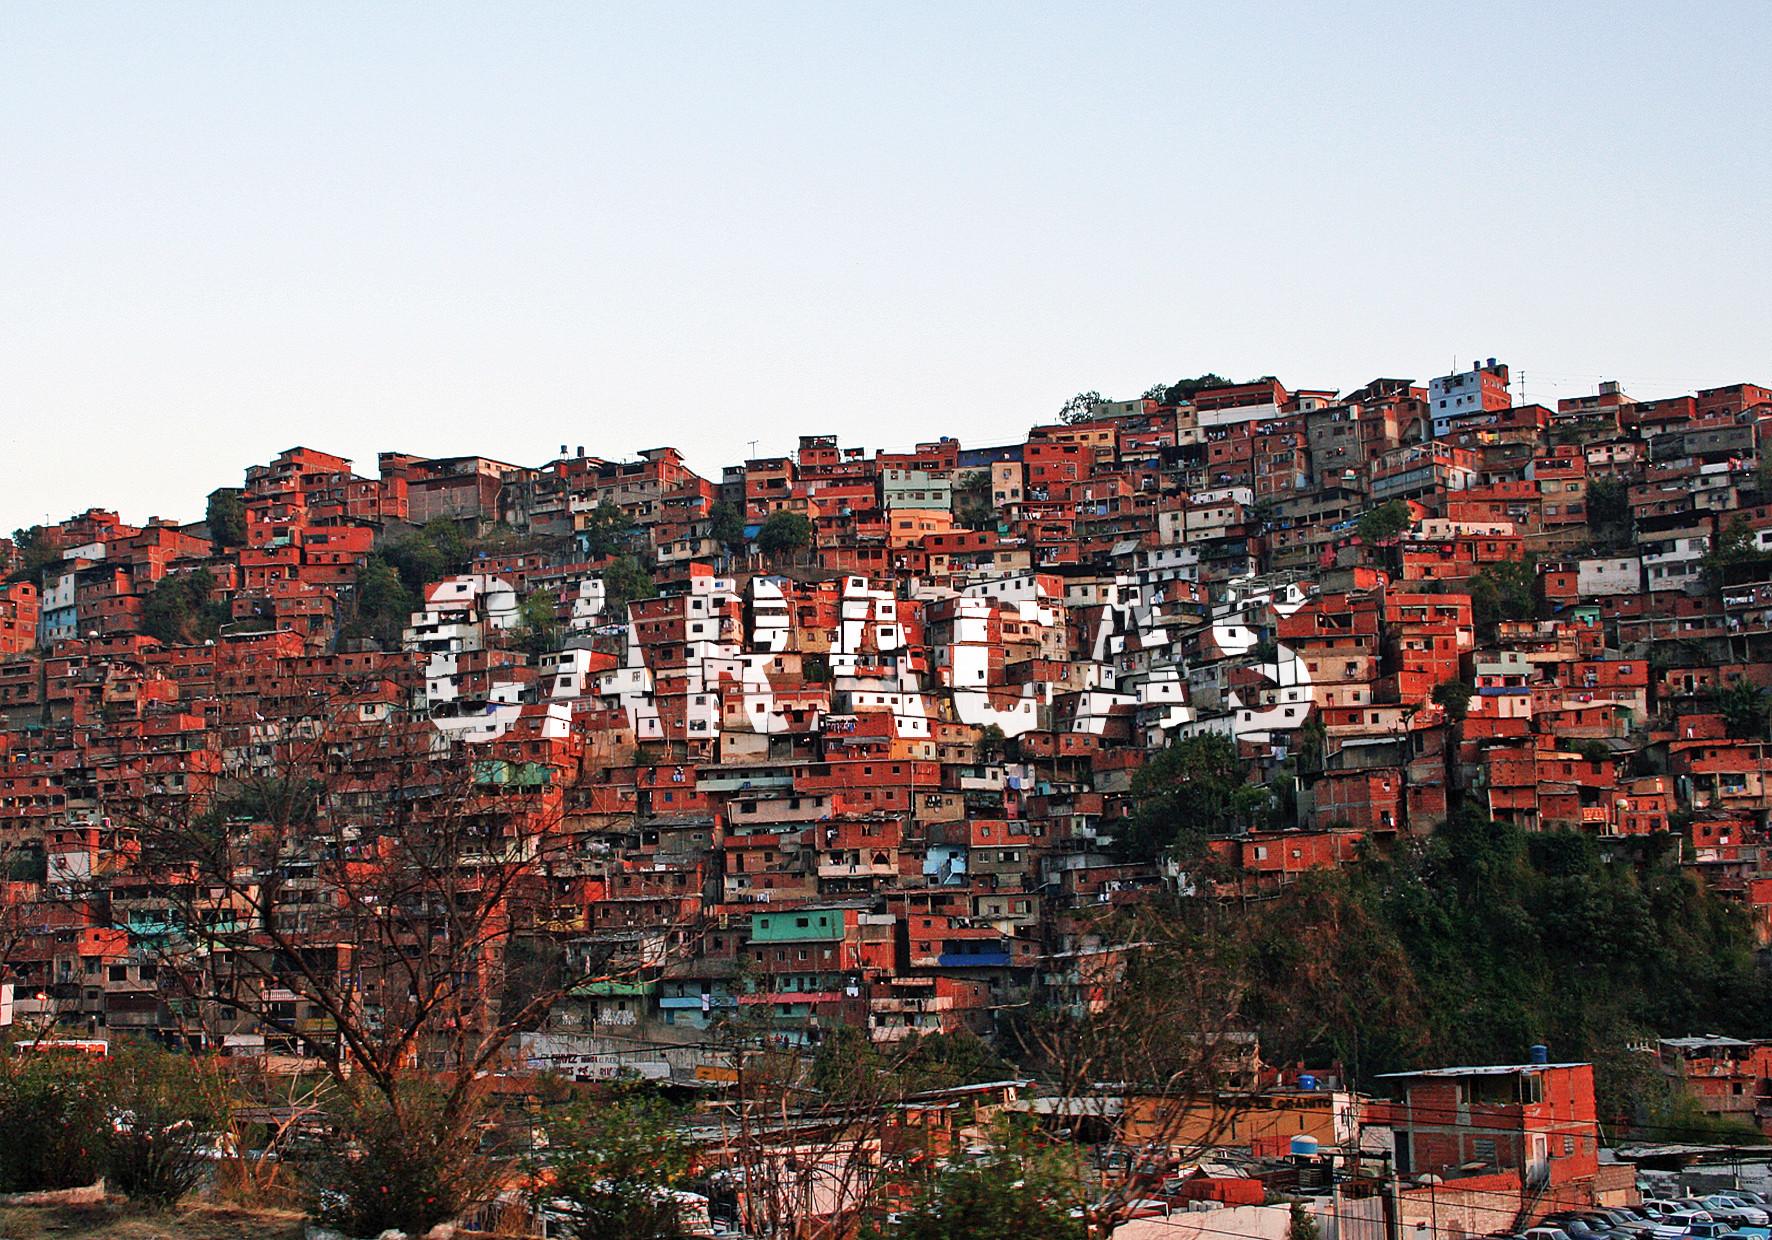 L'esperienza a Caracas (Venezuela) di José